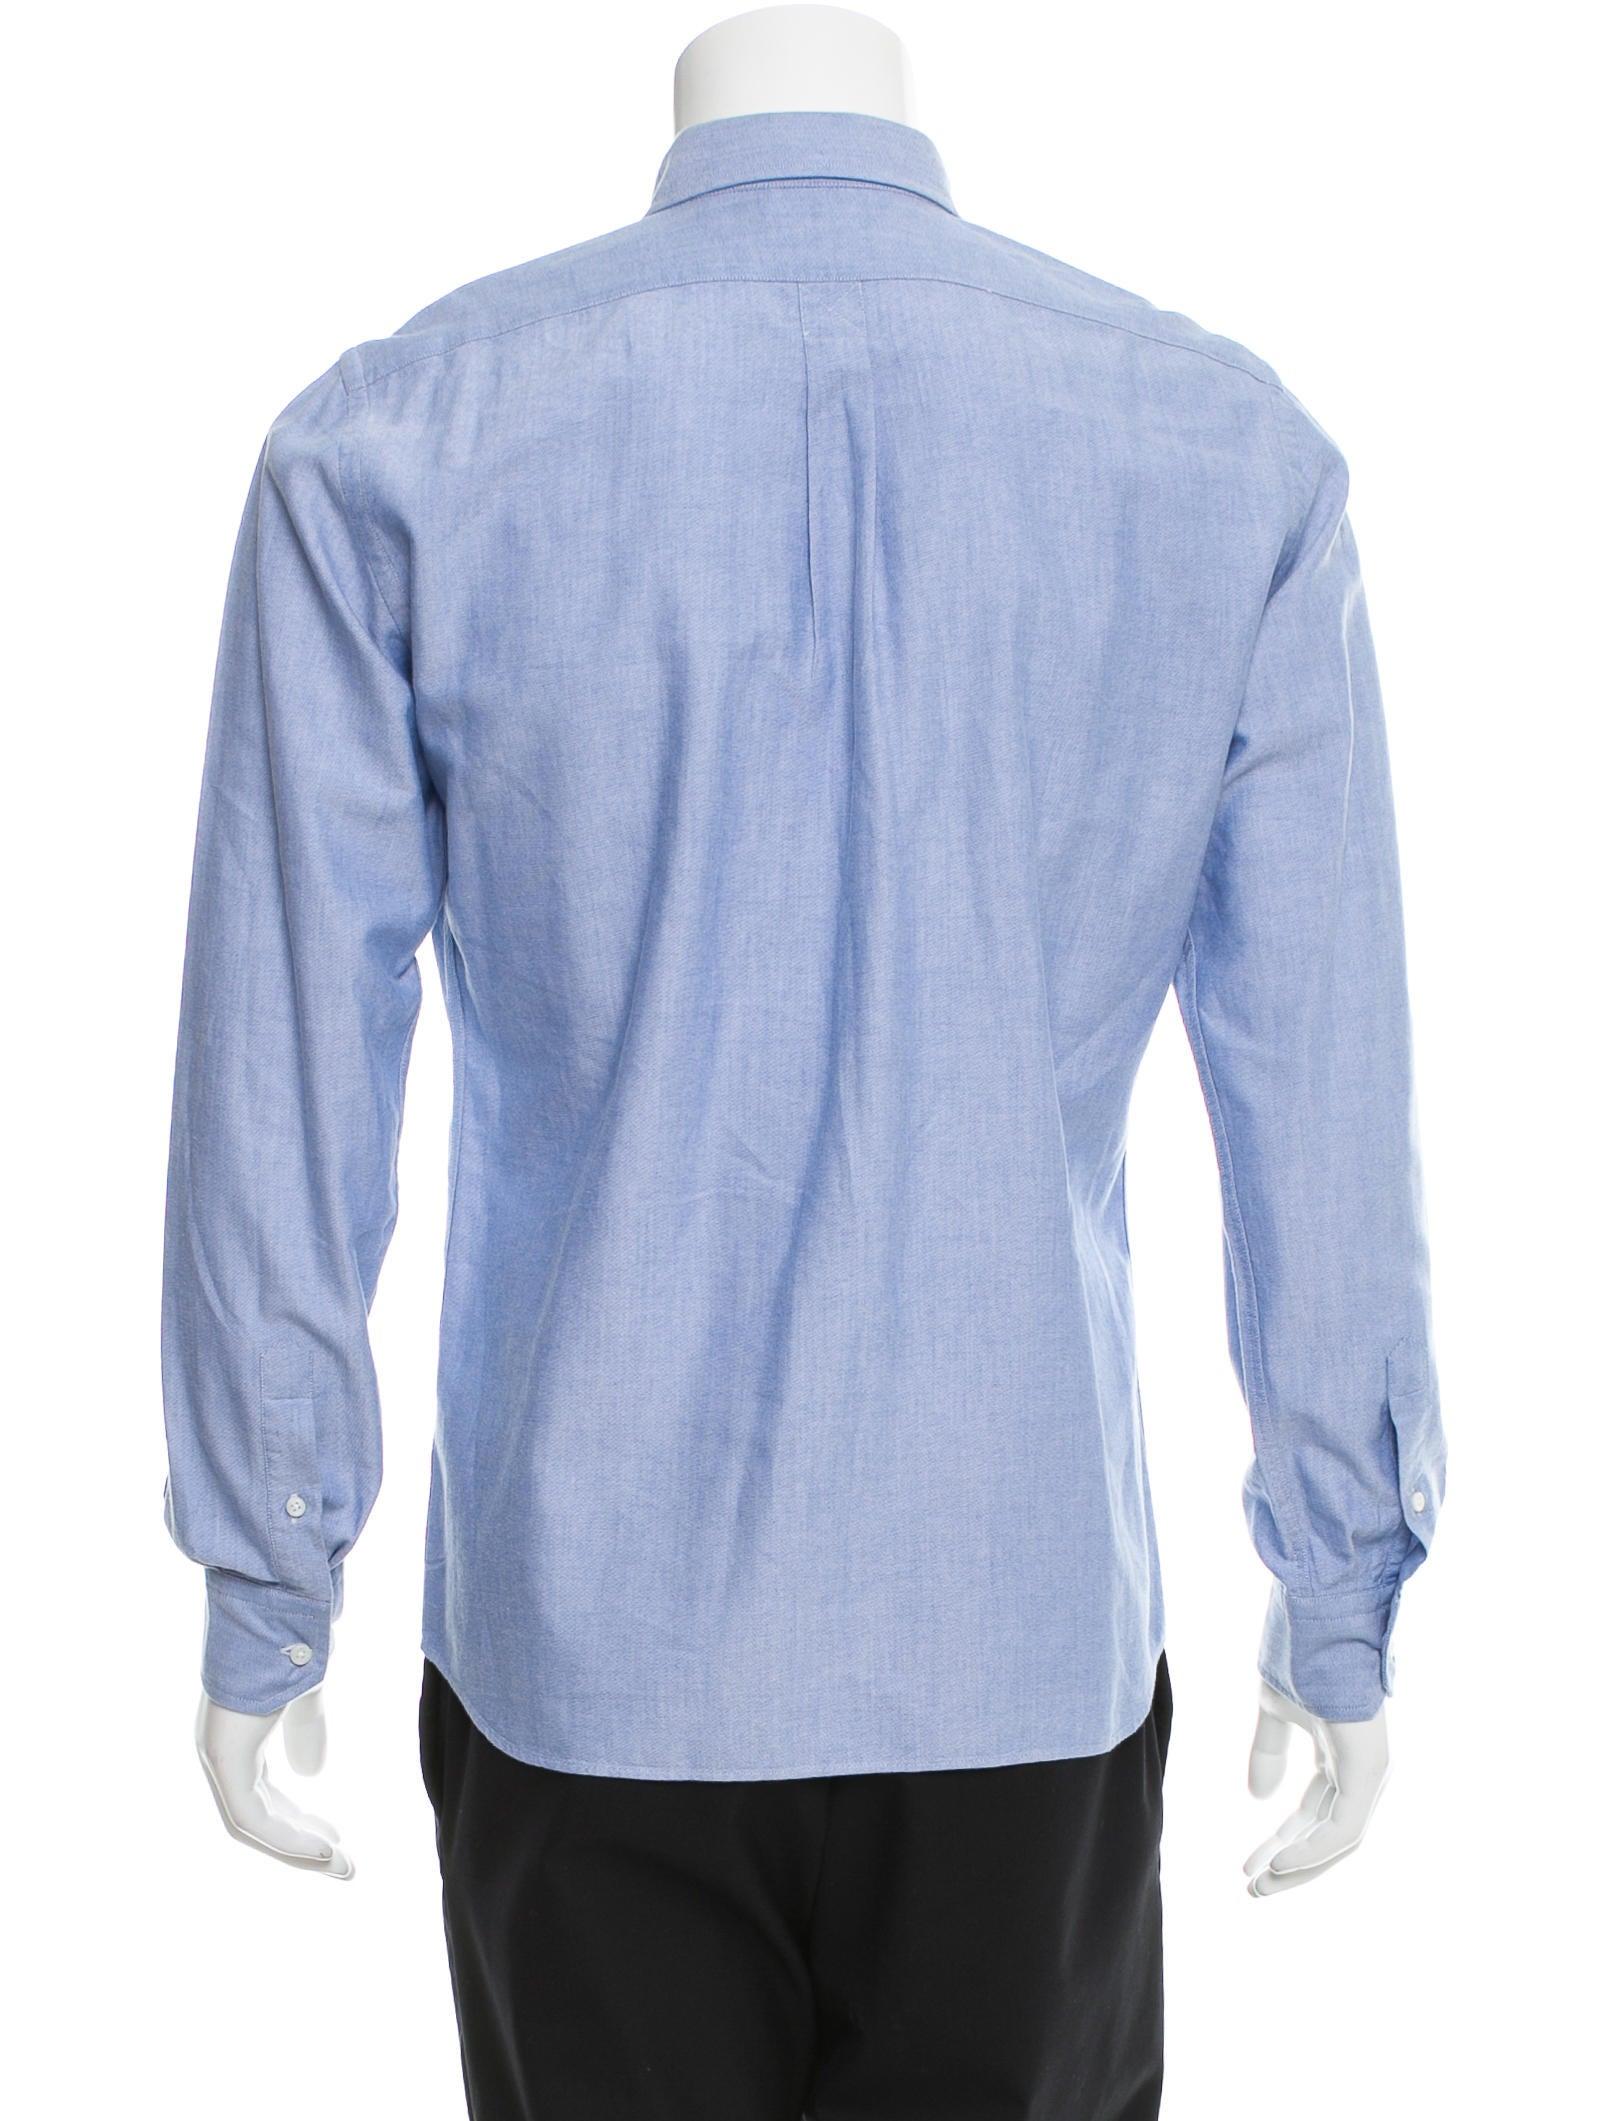 Tomas Maier Long Sleeve Button Up Shirt Clothing